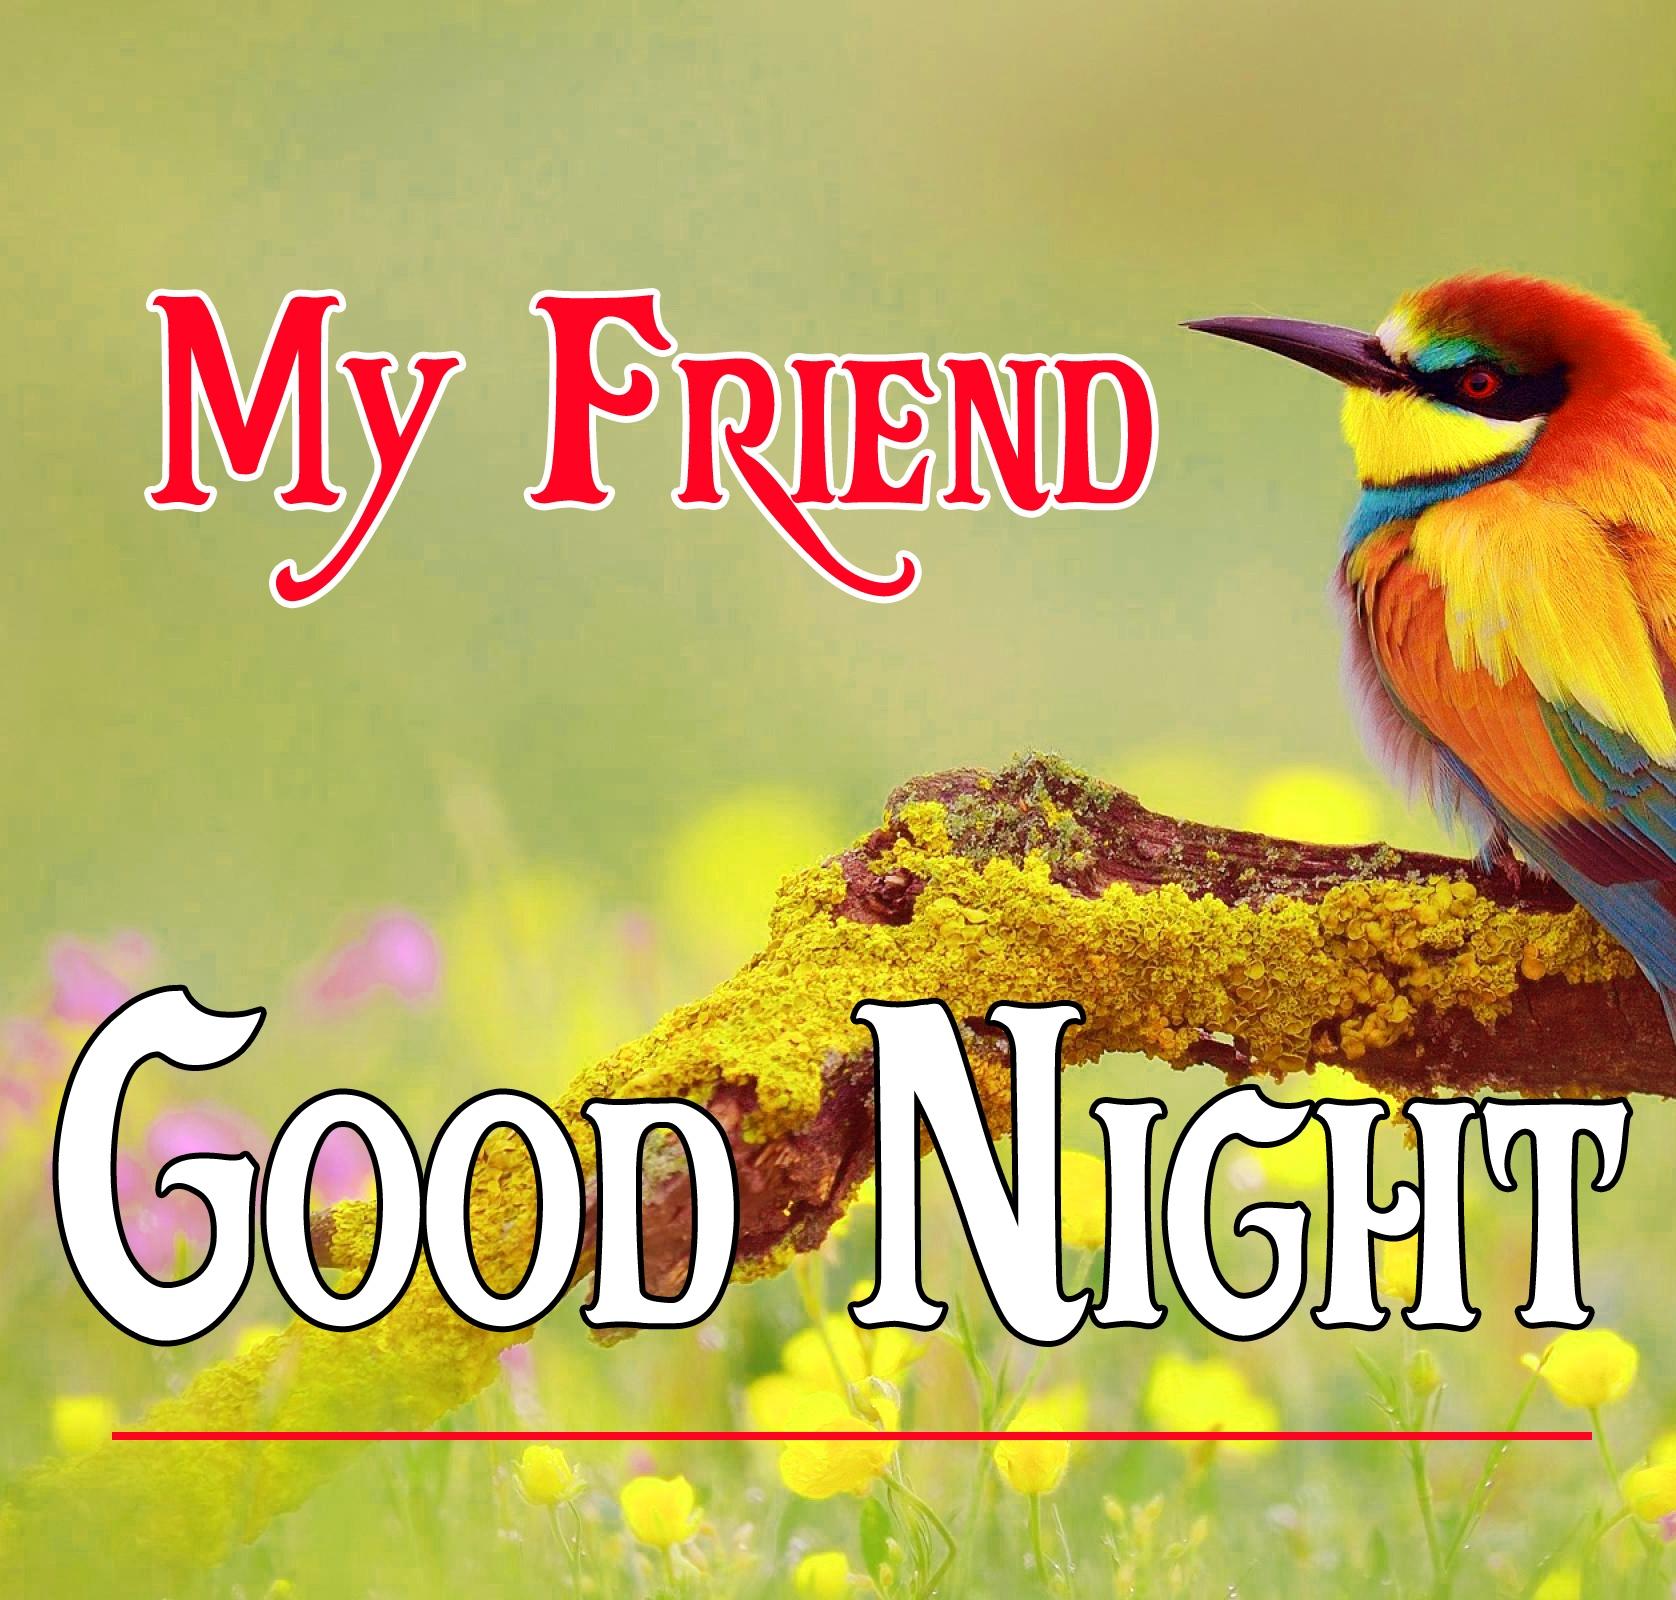 Free good night Images 5